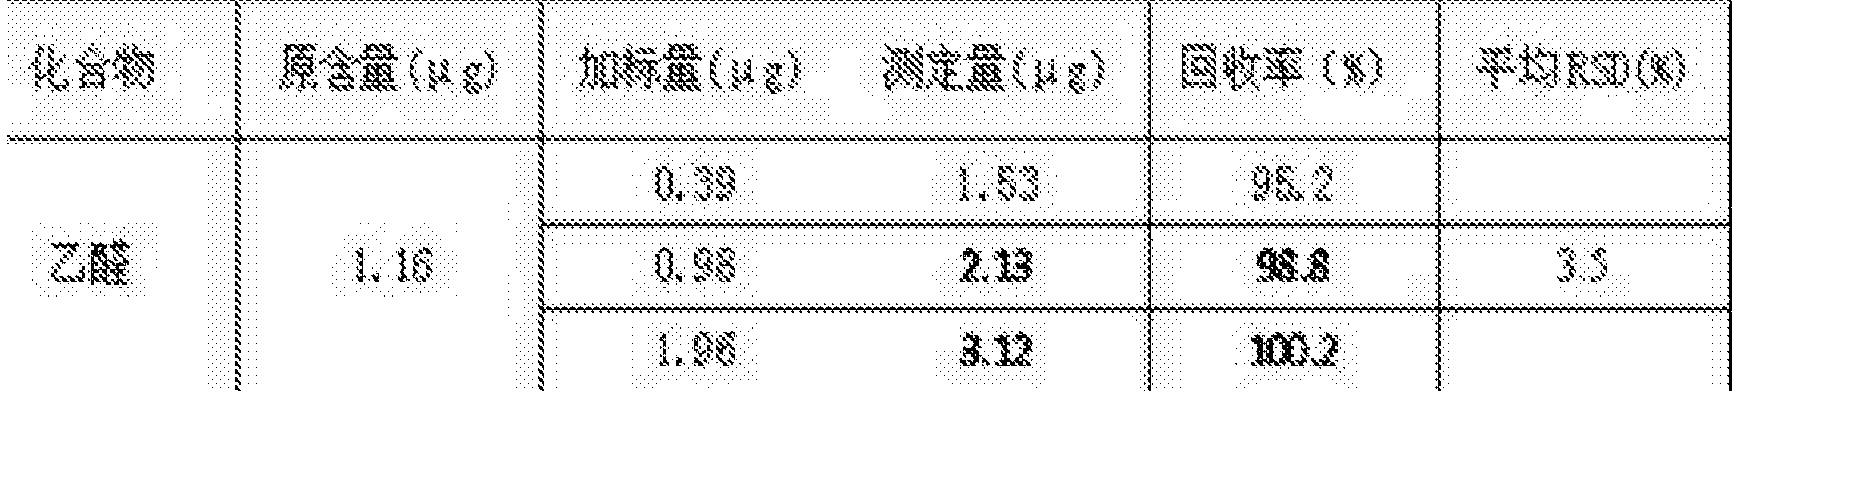 Figure CN106198806AD00062